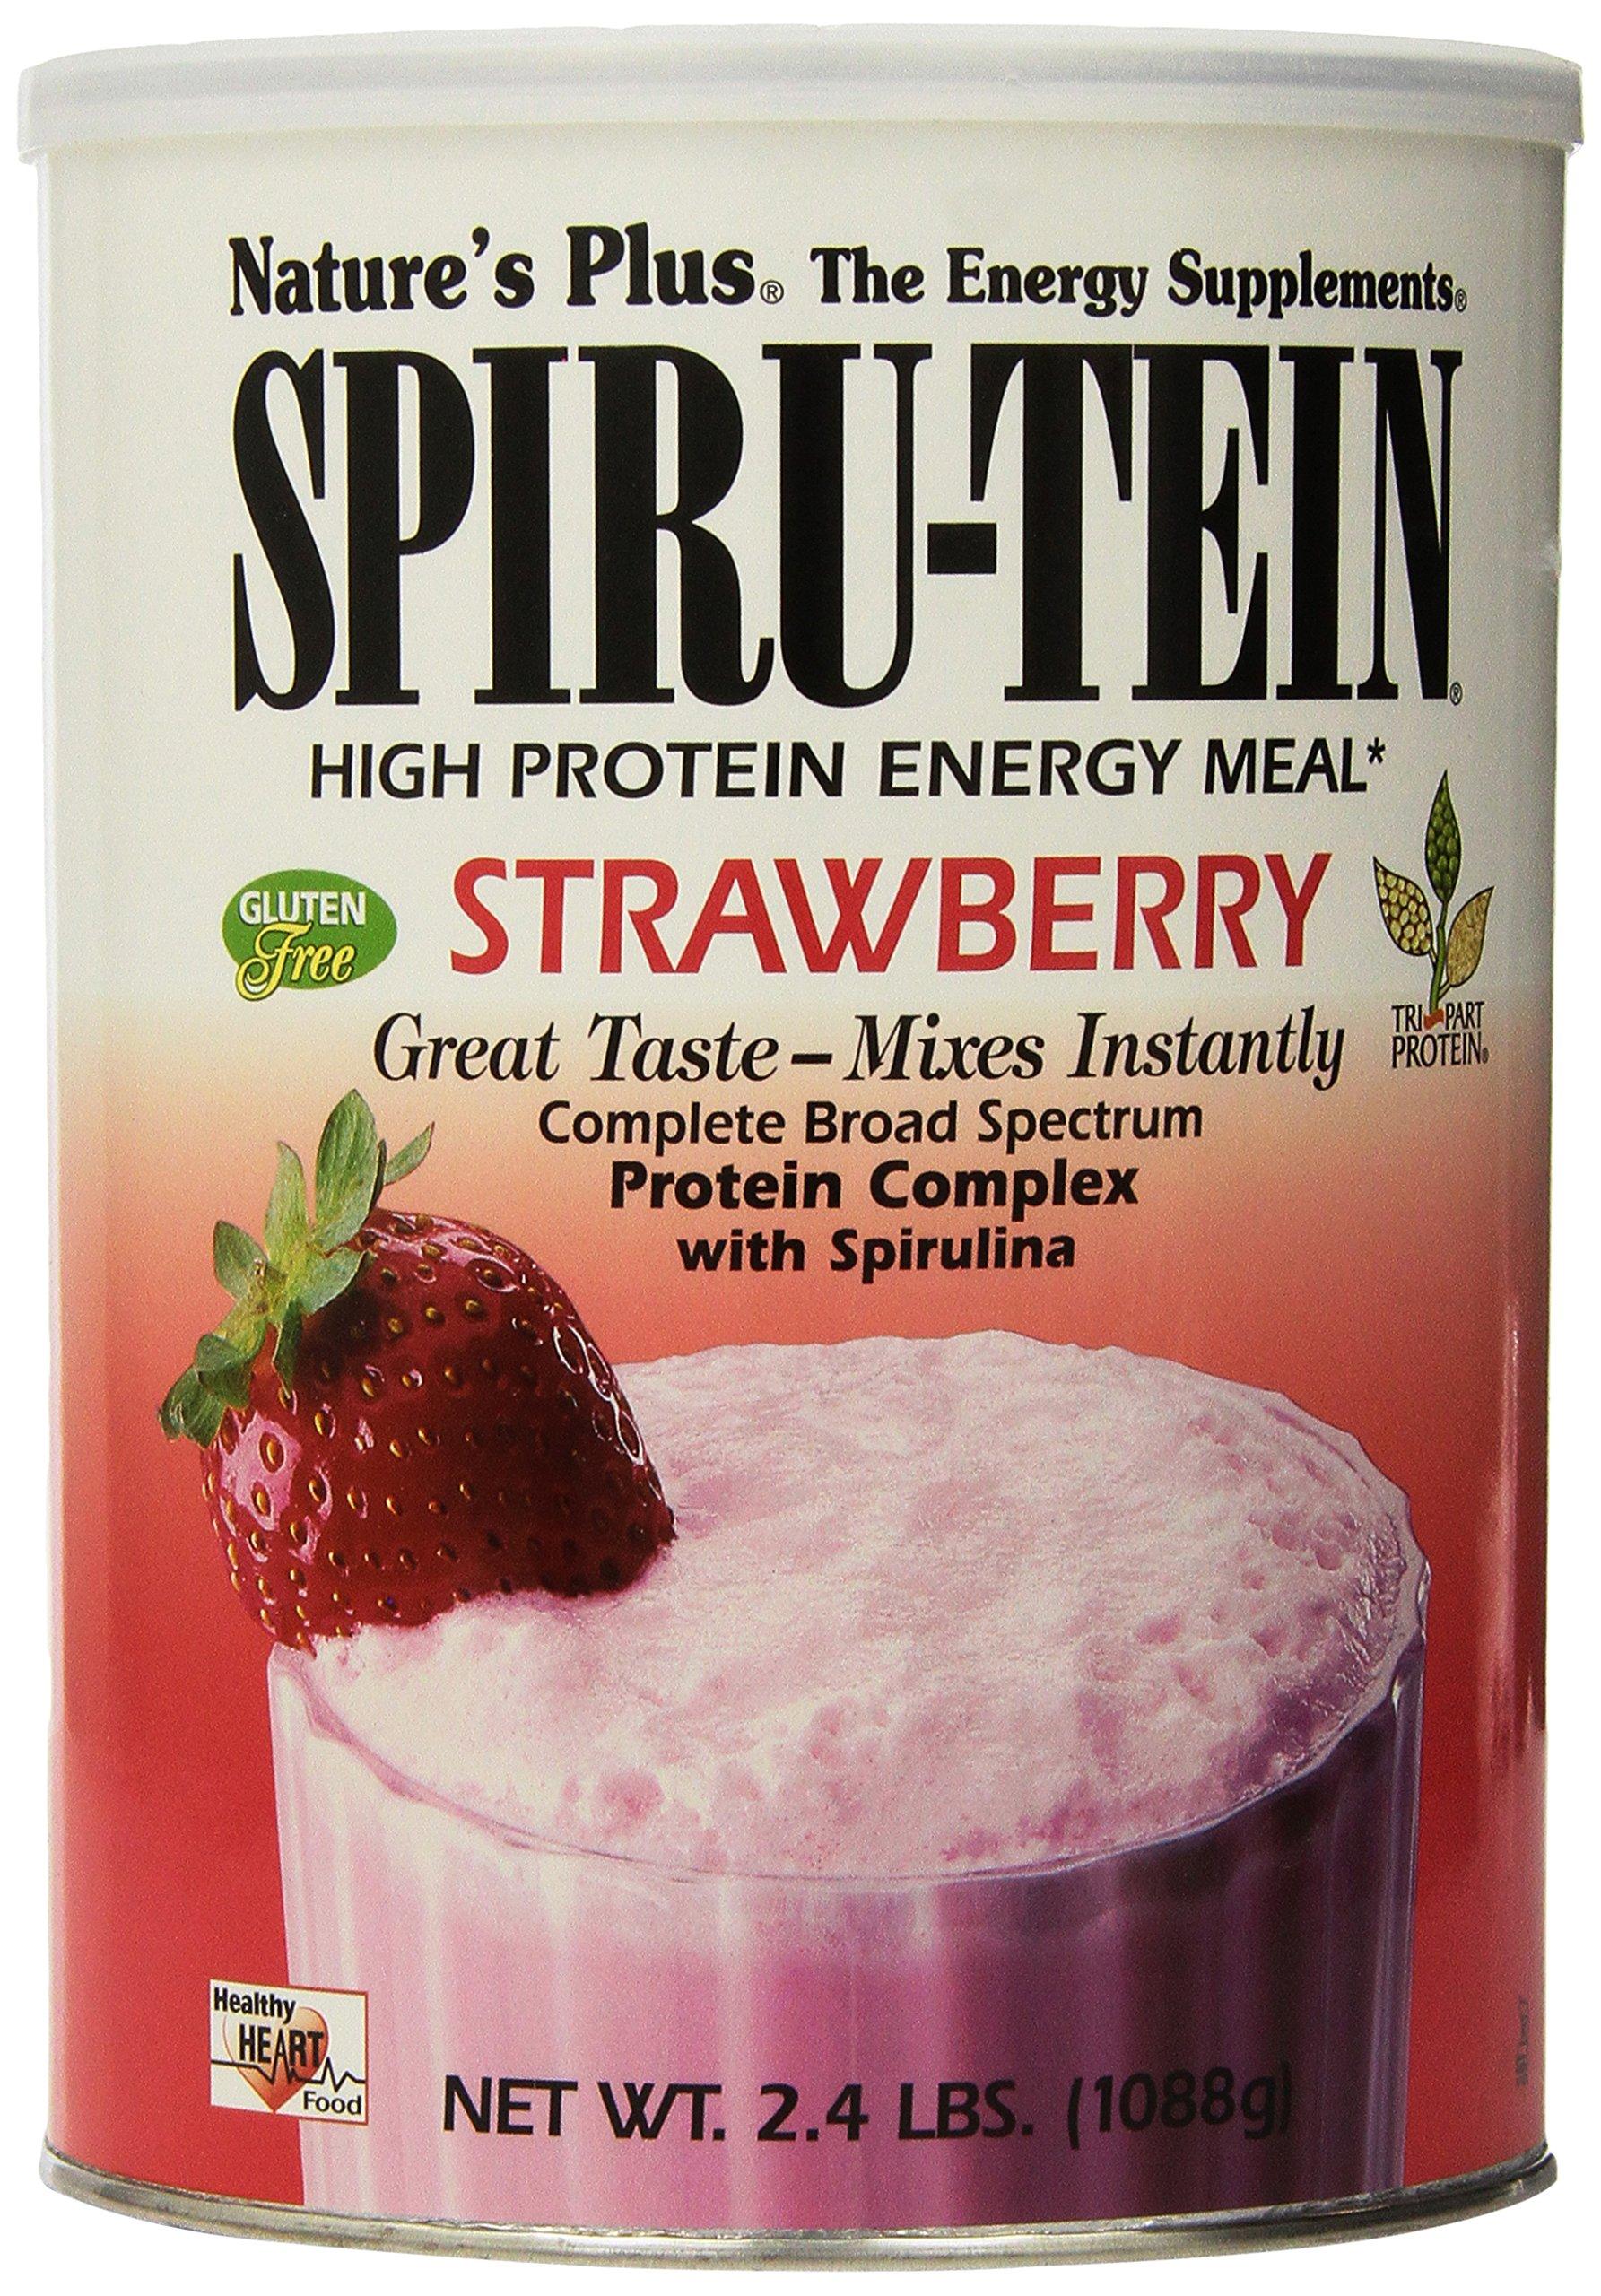 Nature's Plus - Strawberry SPIRU-TEIN Shake, 2.4 lbs powder